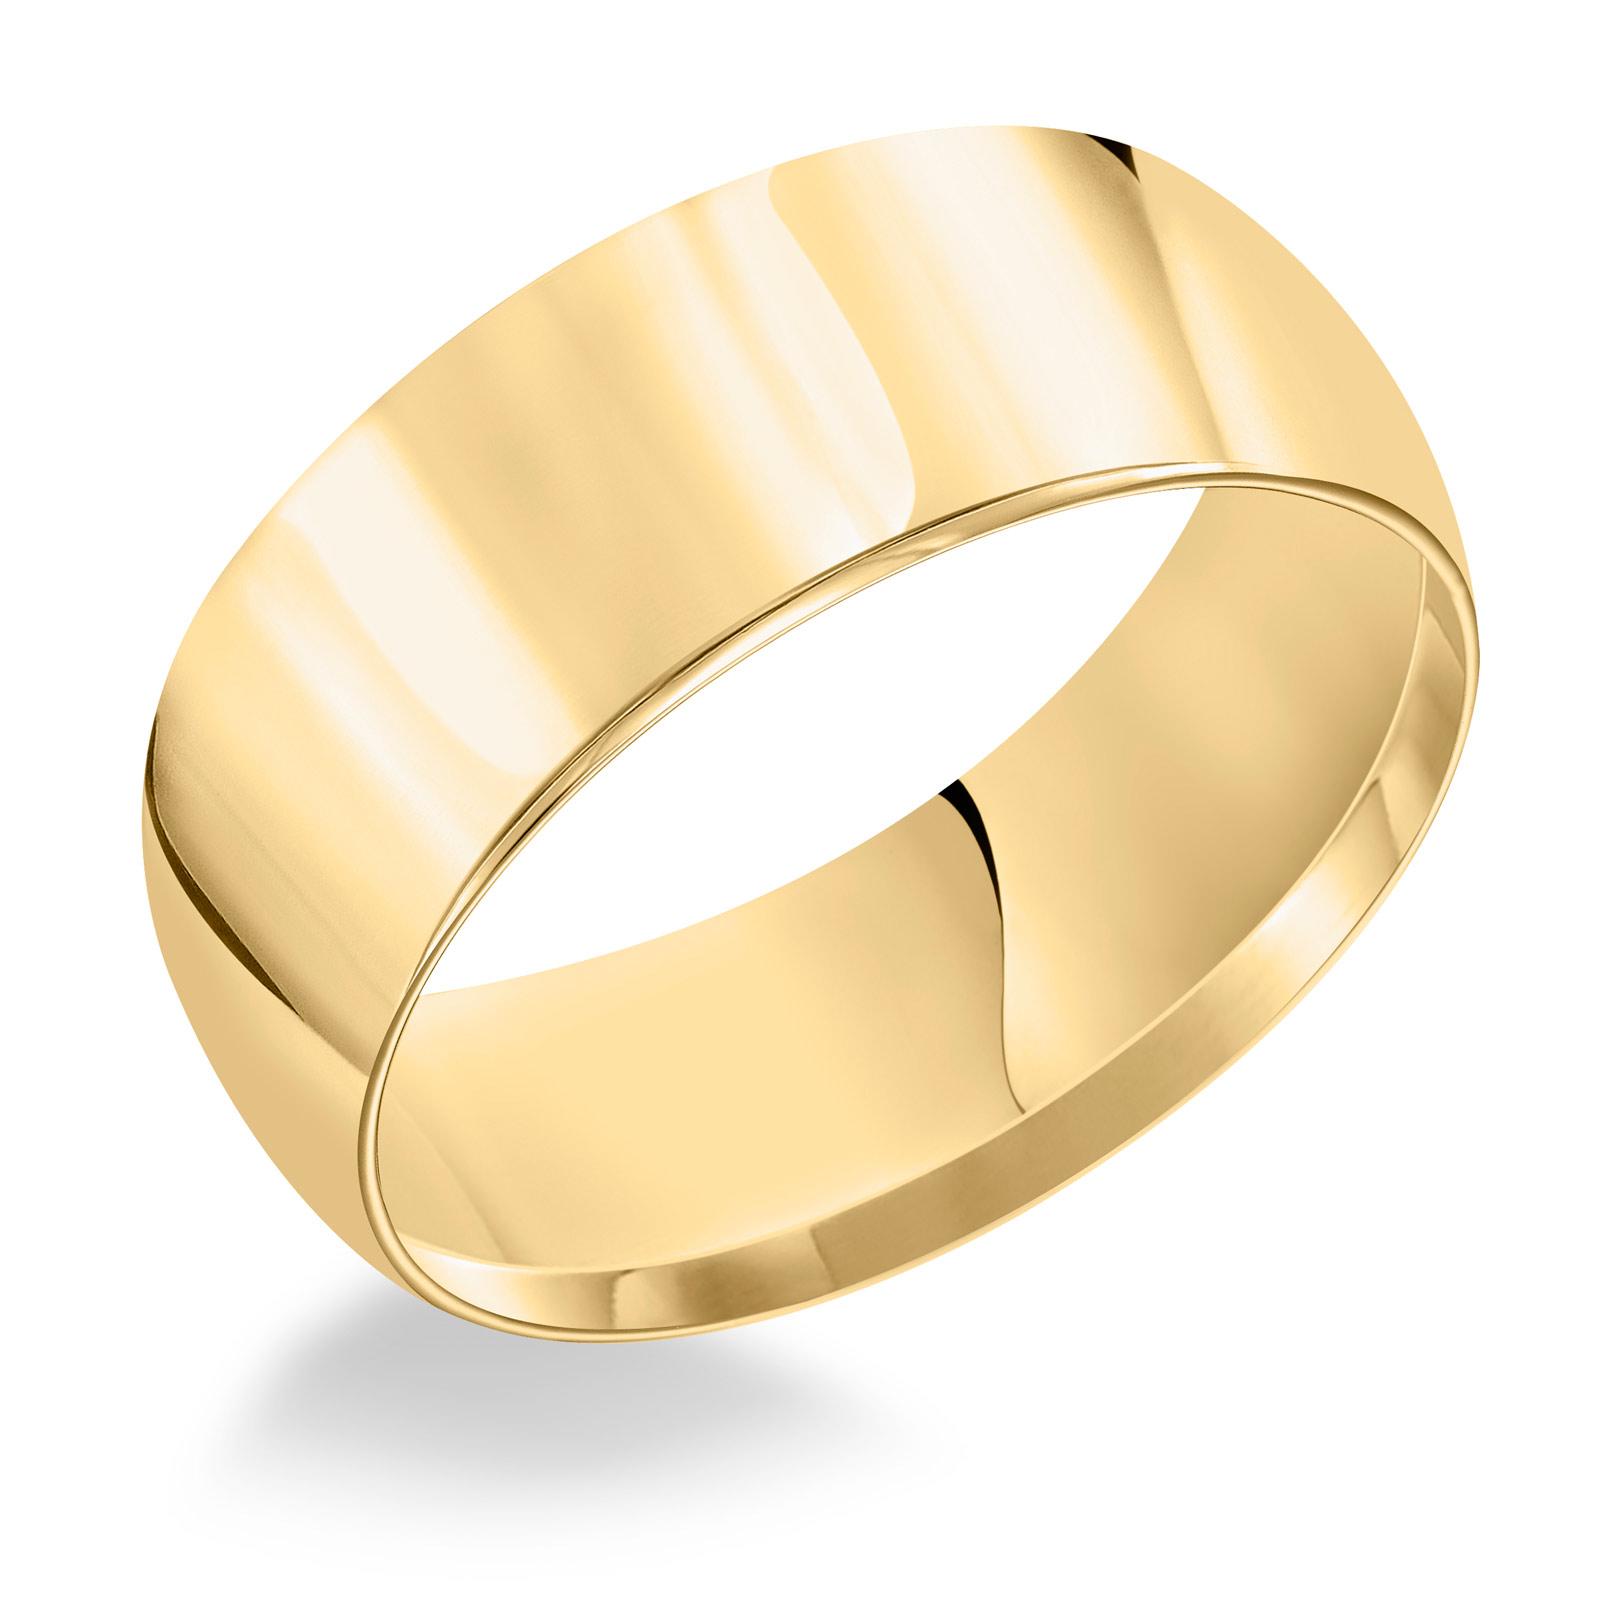 Goldman ring 01 ldir080 g00 long island ny mens for Long island wedding bands